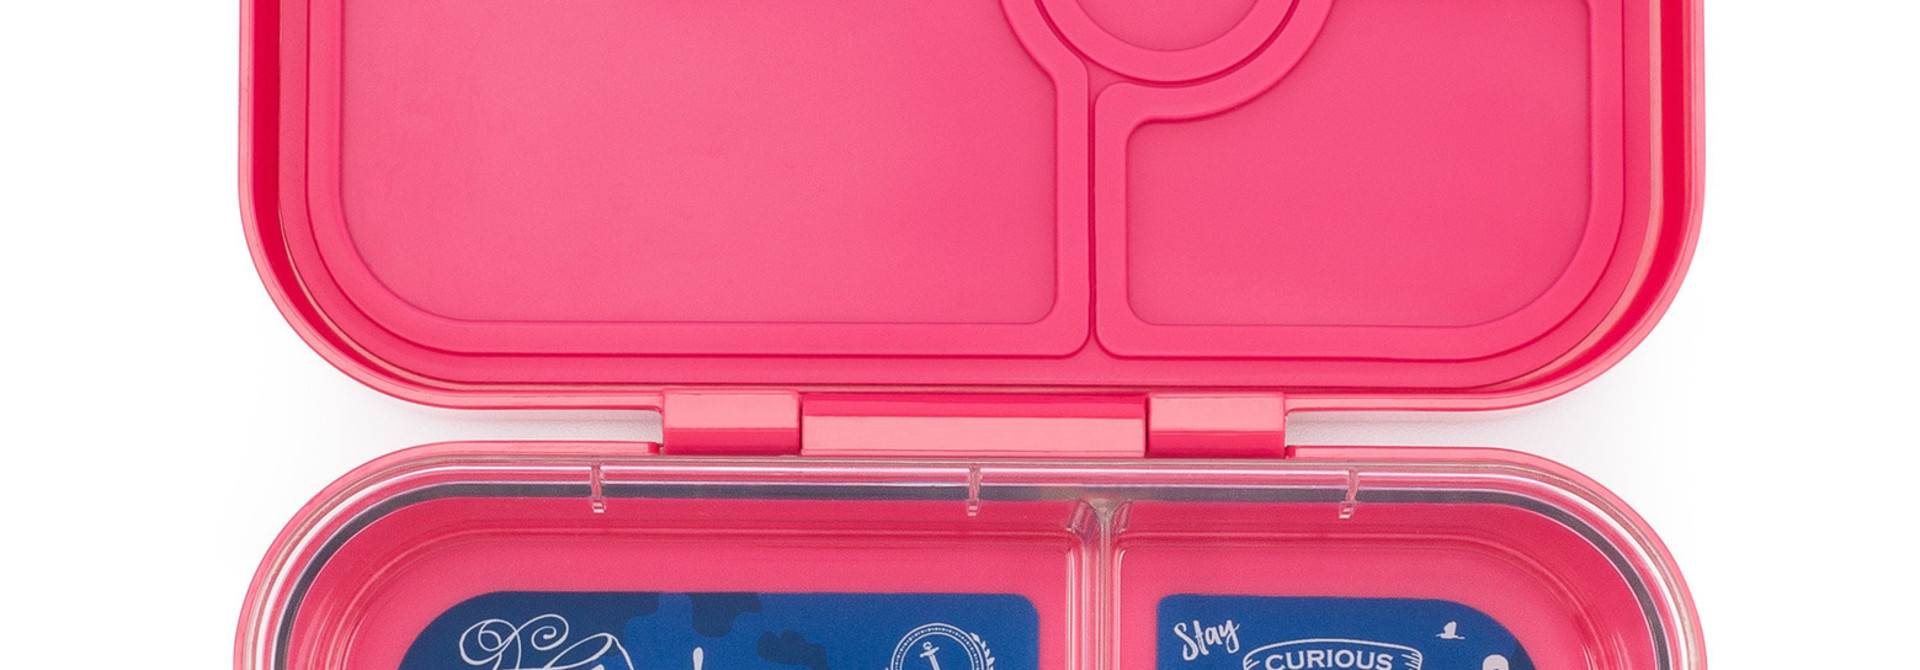 Yumbox Panino 4-sections Lotus pink / Explore tray